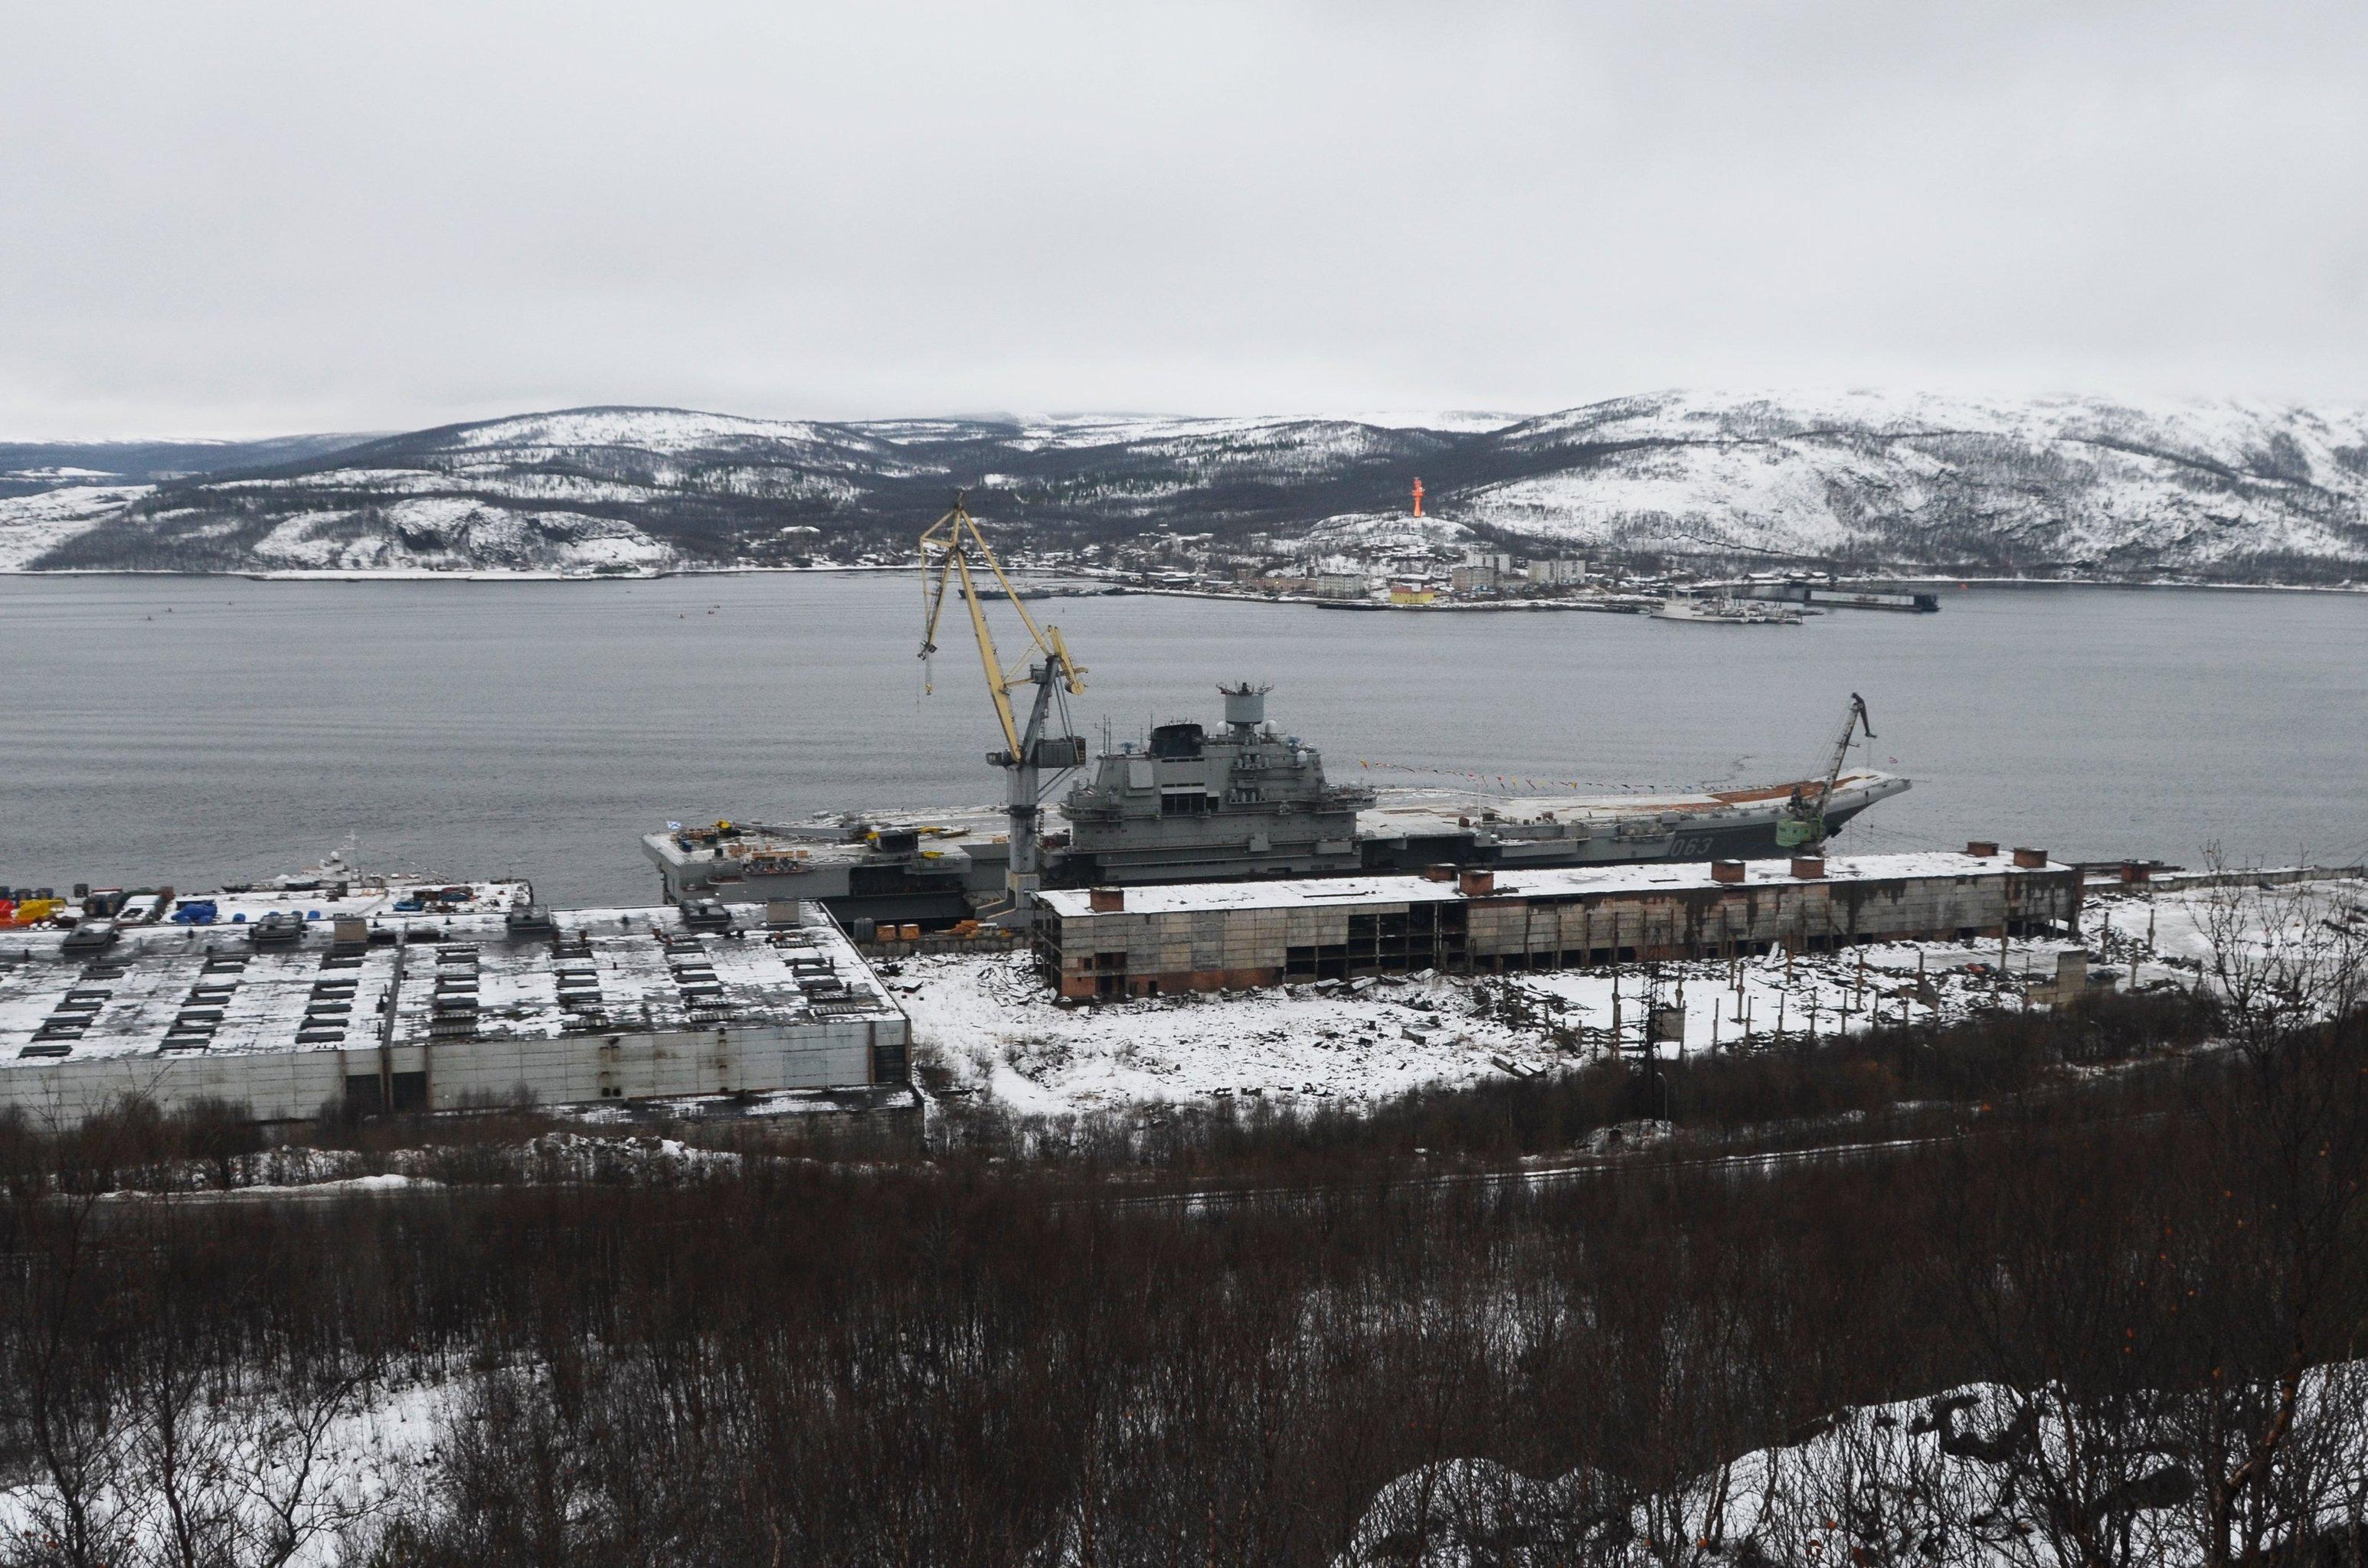 Aircraft Carrier Admiral Kuznetsov: News #2 - Page 10 13-6866573-1532671746